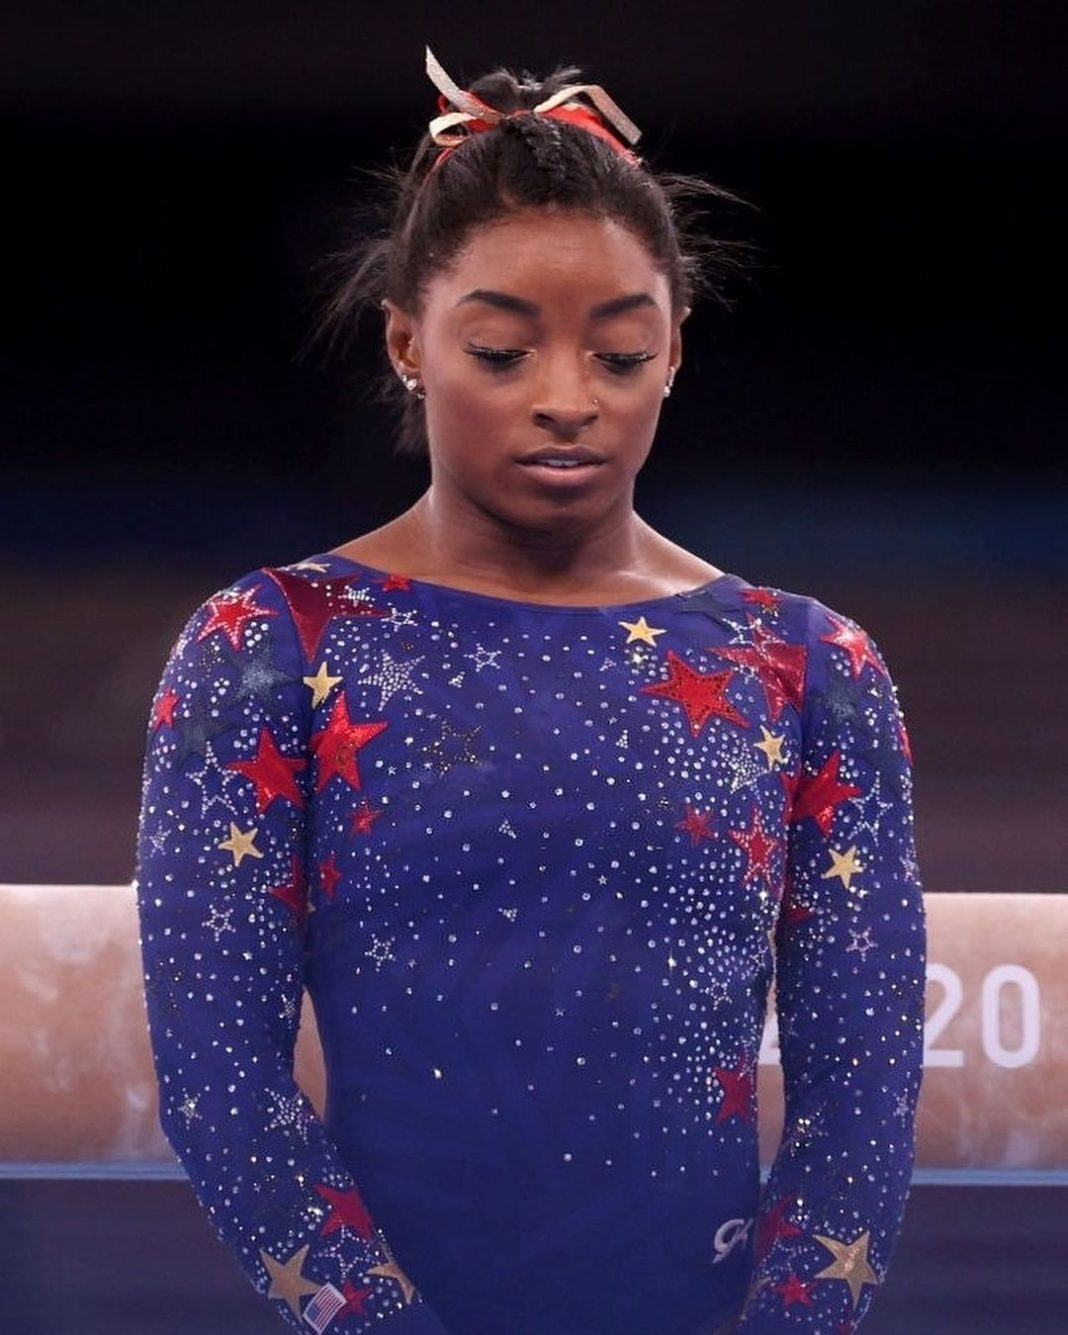 Simone Biles Bags Bronze Medal